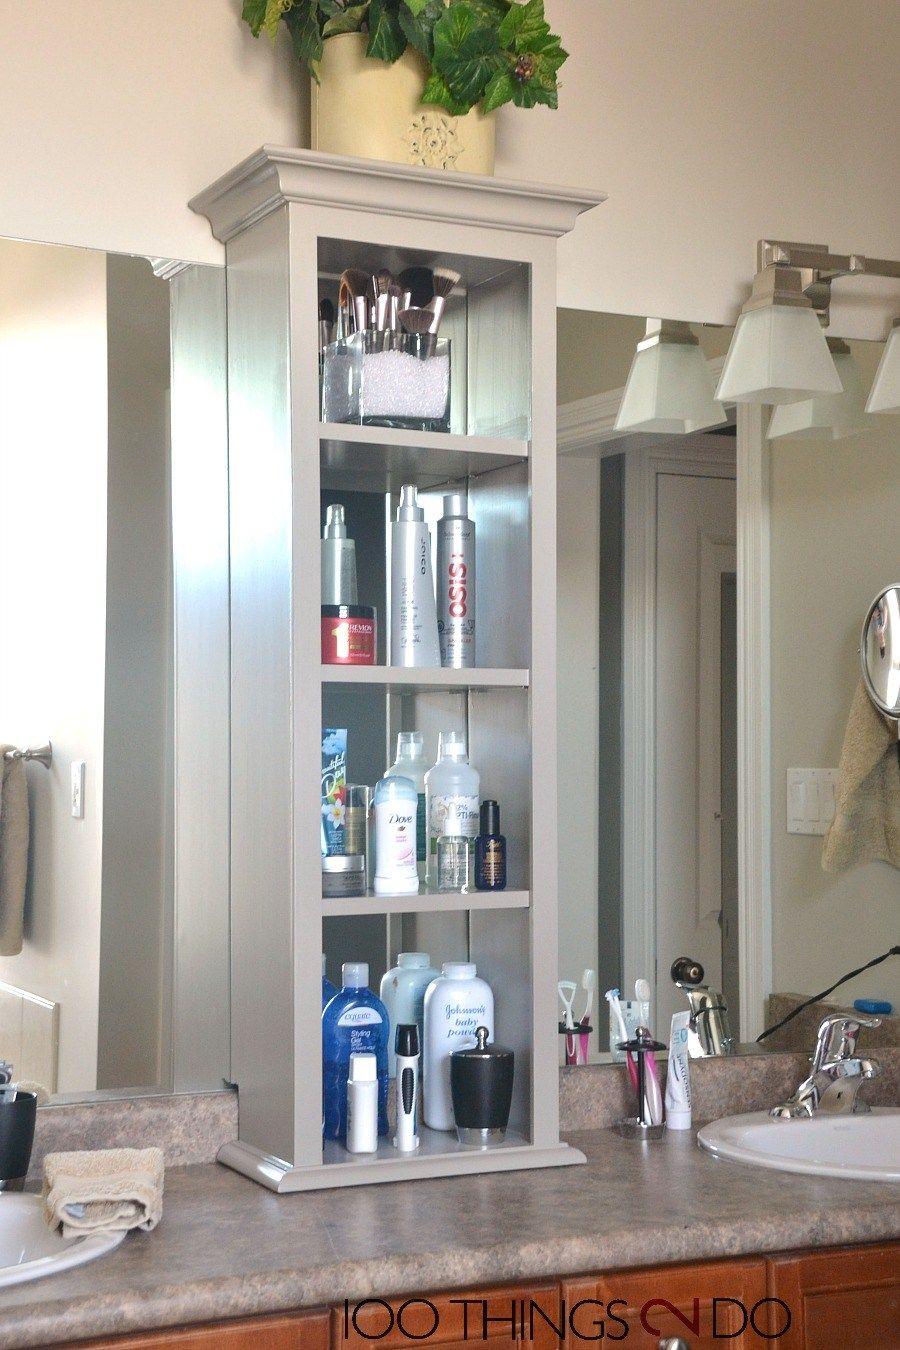 Bathroom Vanity Storage Design Http Tyuka Info Bathroom Vanity Storage Design Bathroom Vanity Storage Bathroom Cabinets Diy Bathroom Vanity Organization